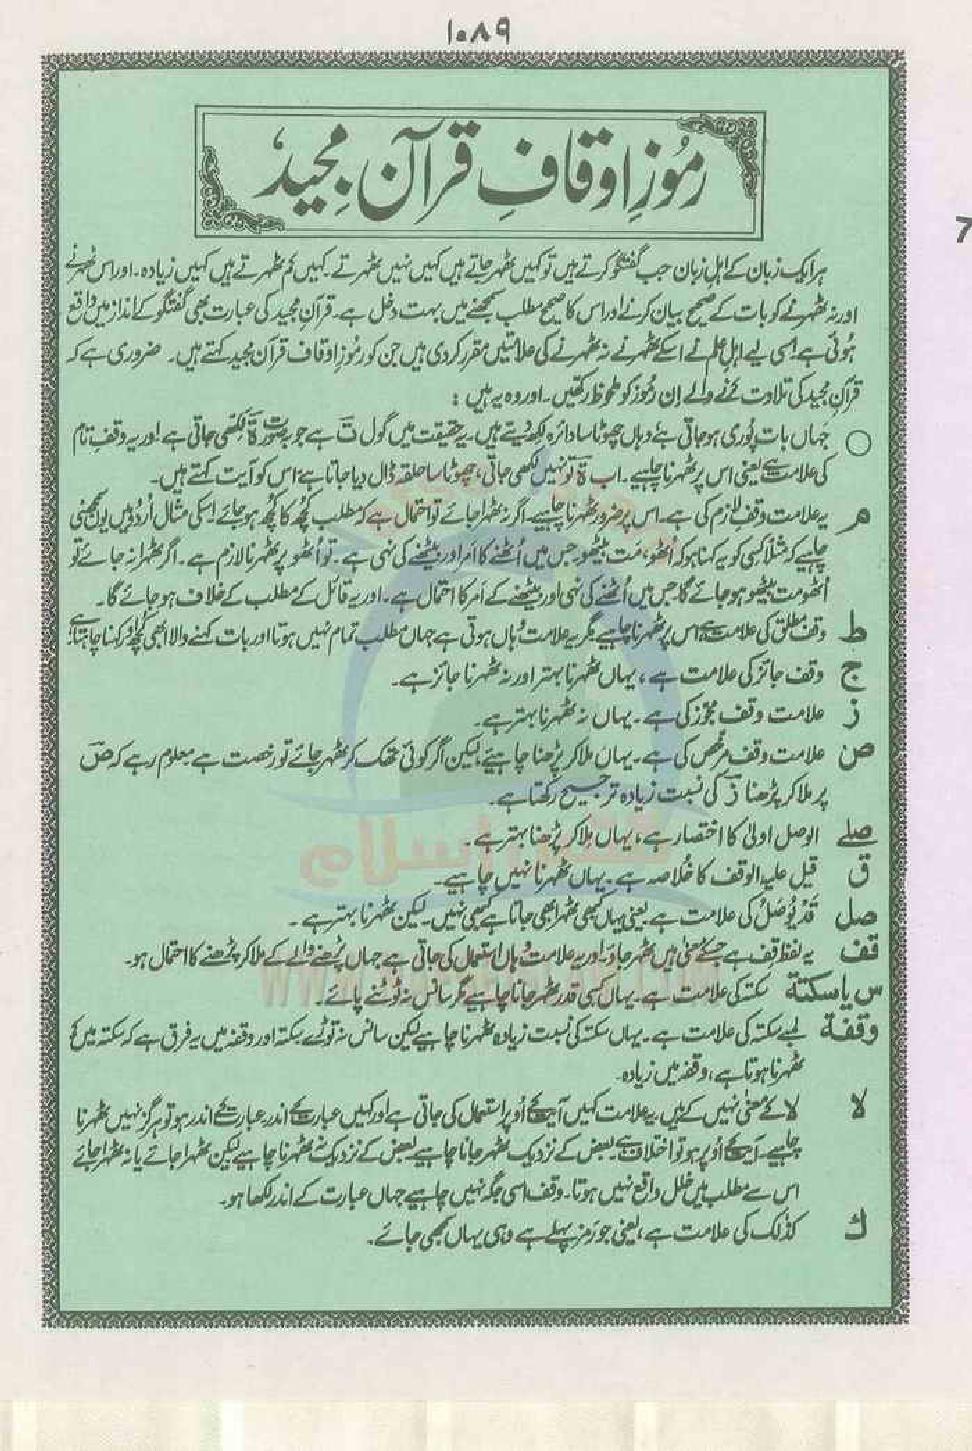 Kanz-ul-Iman (Recitation & Translation): Ramooz-e-Oqaaf-e